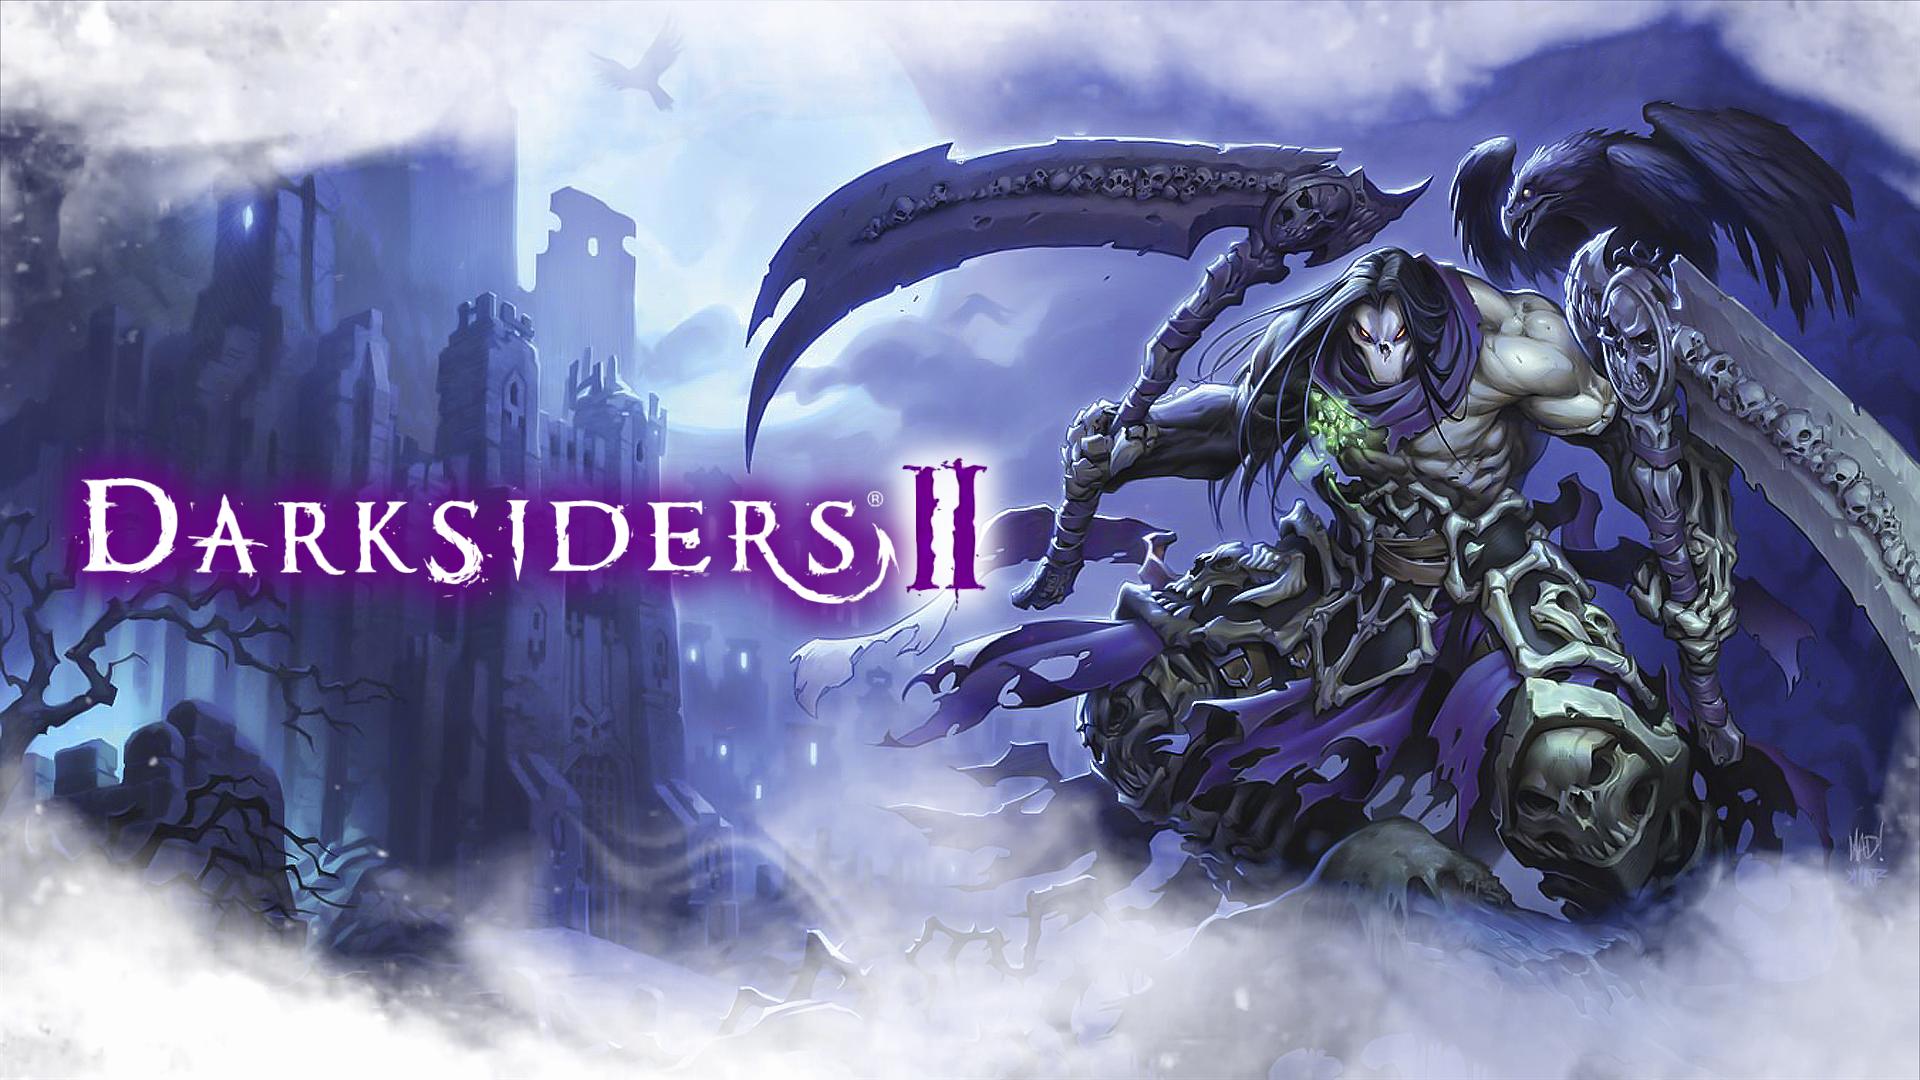 Darksiders 2 Wallpaper 6 Wallpapersbq